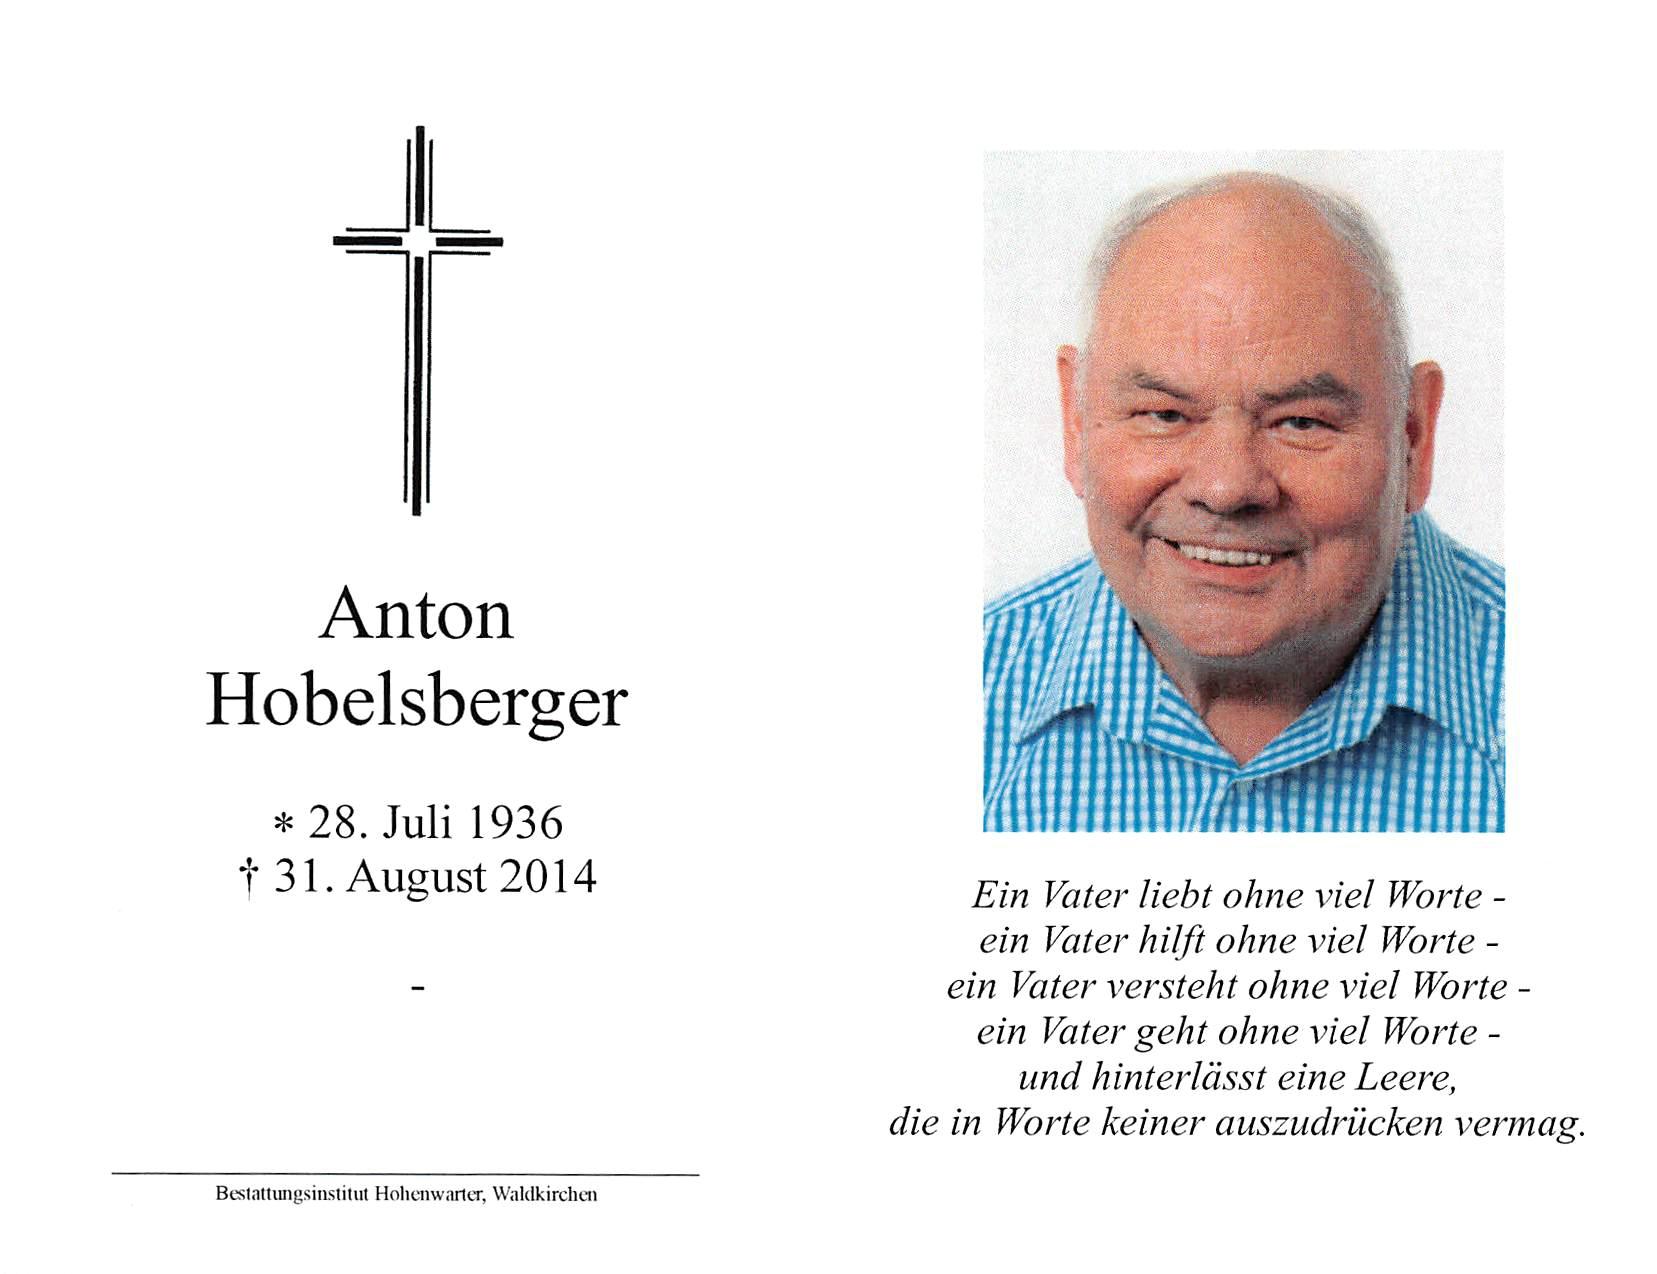 2014-08-31-Hobelsberger-Anton-Metzgermeister-Waldkirchen